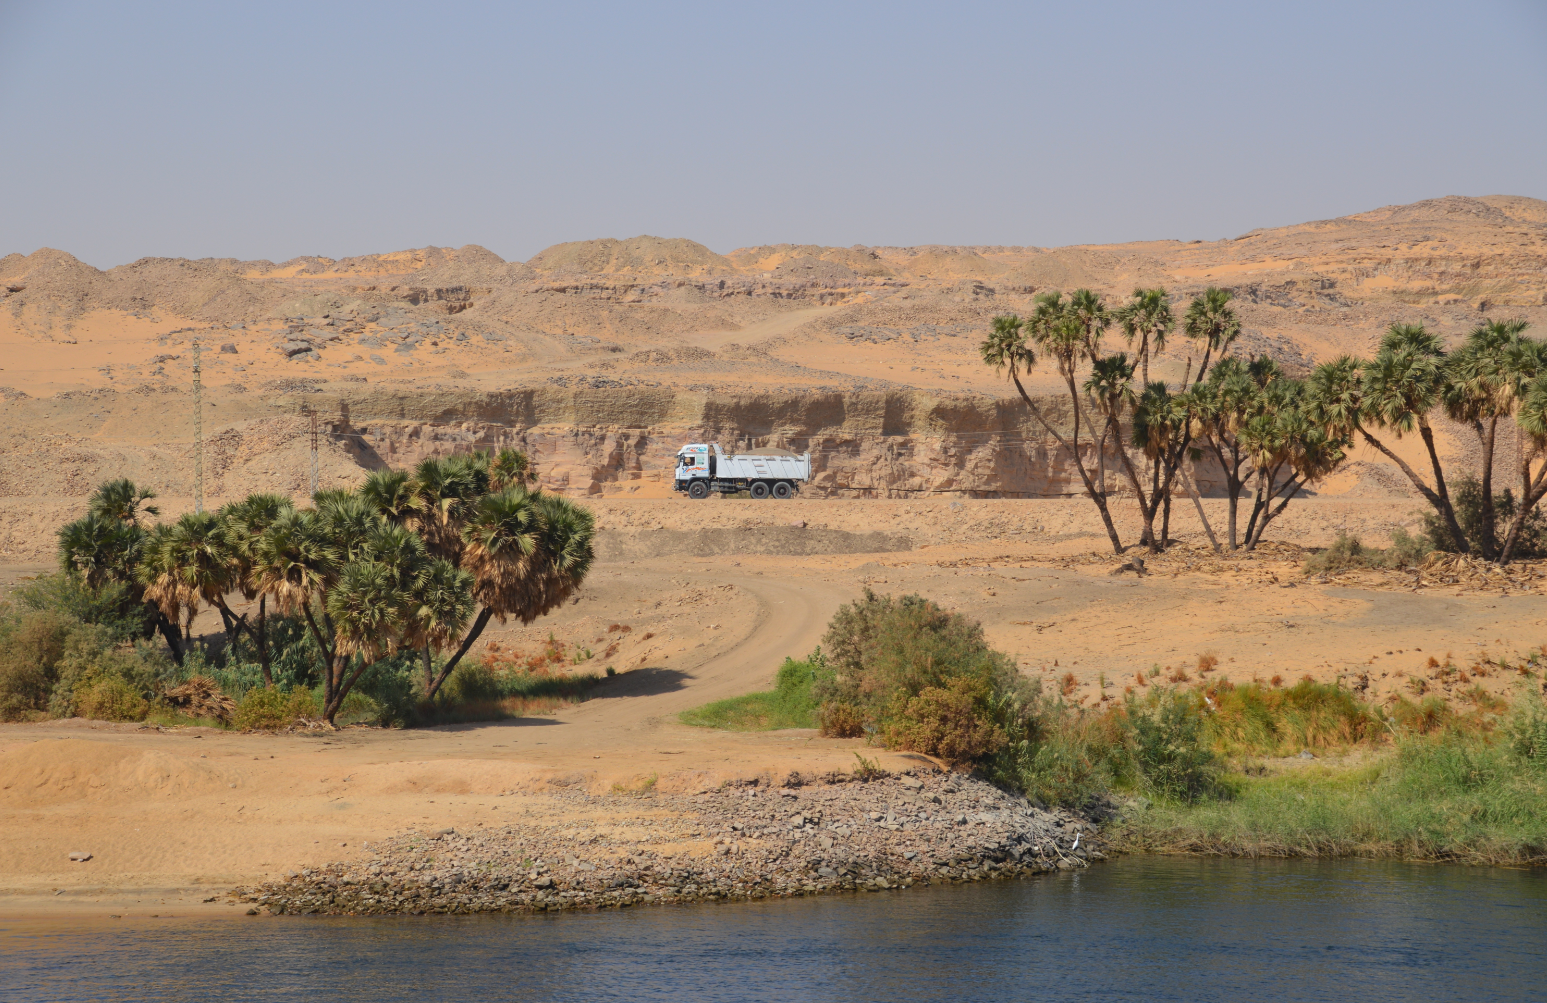 Wunderschöne Landschaften entlang des Nil-Ufers